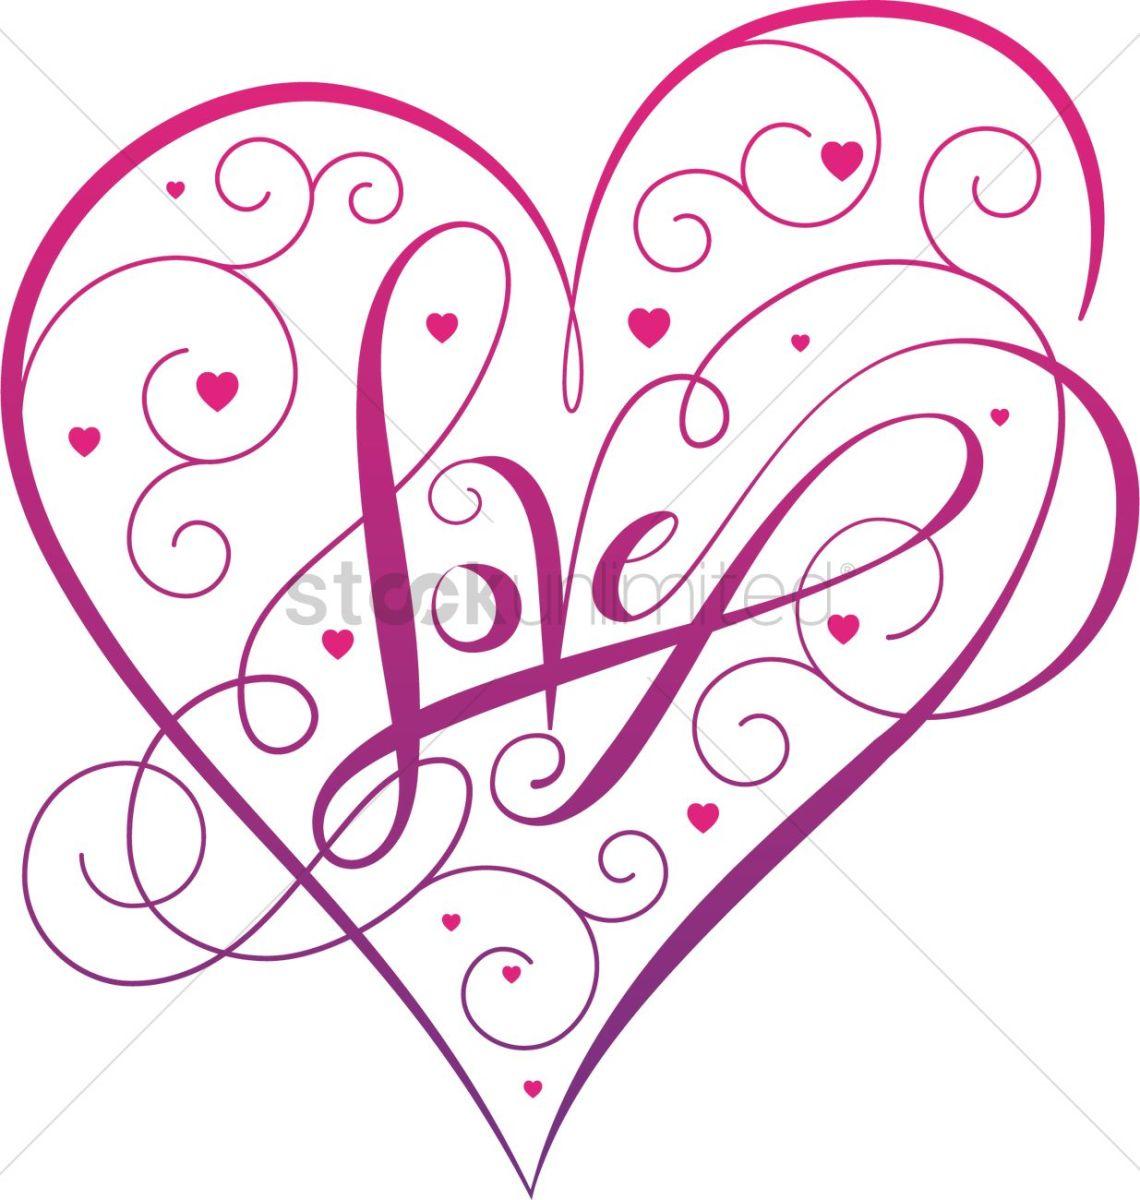 Download Love design Vector Image - 2022329 | StockUnlimited